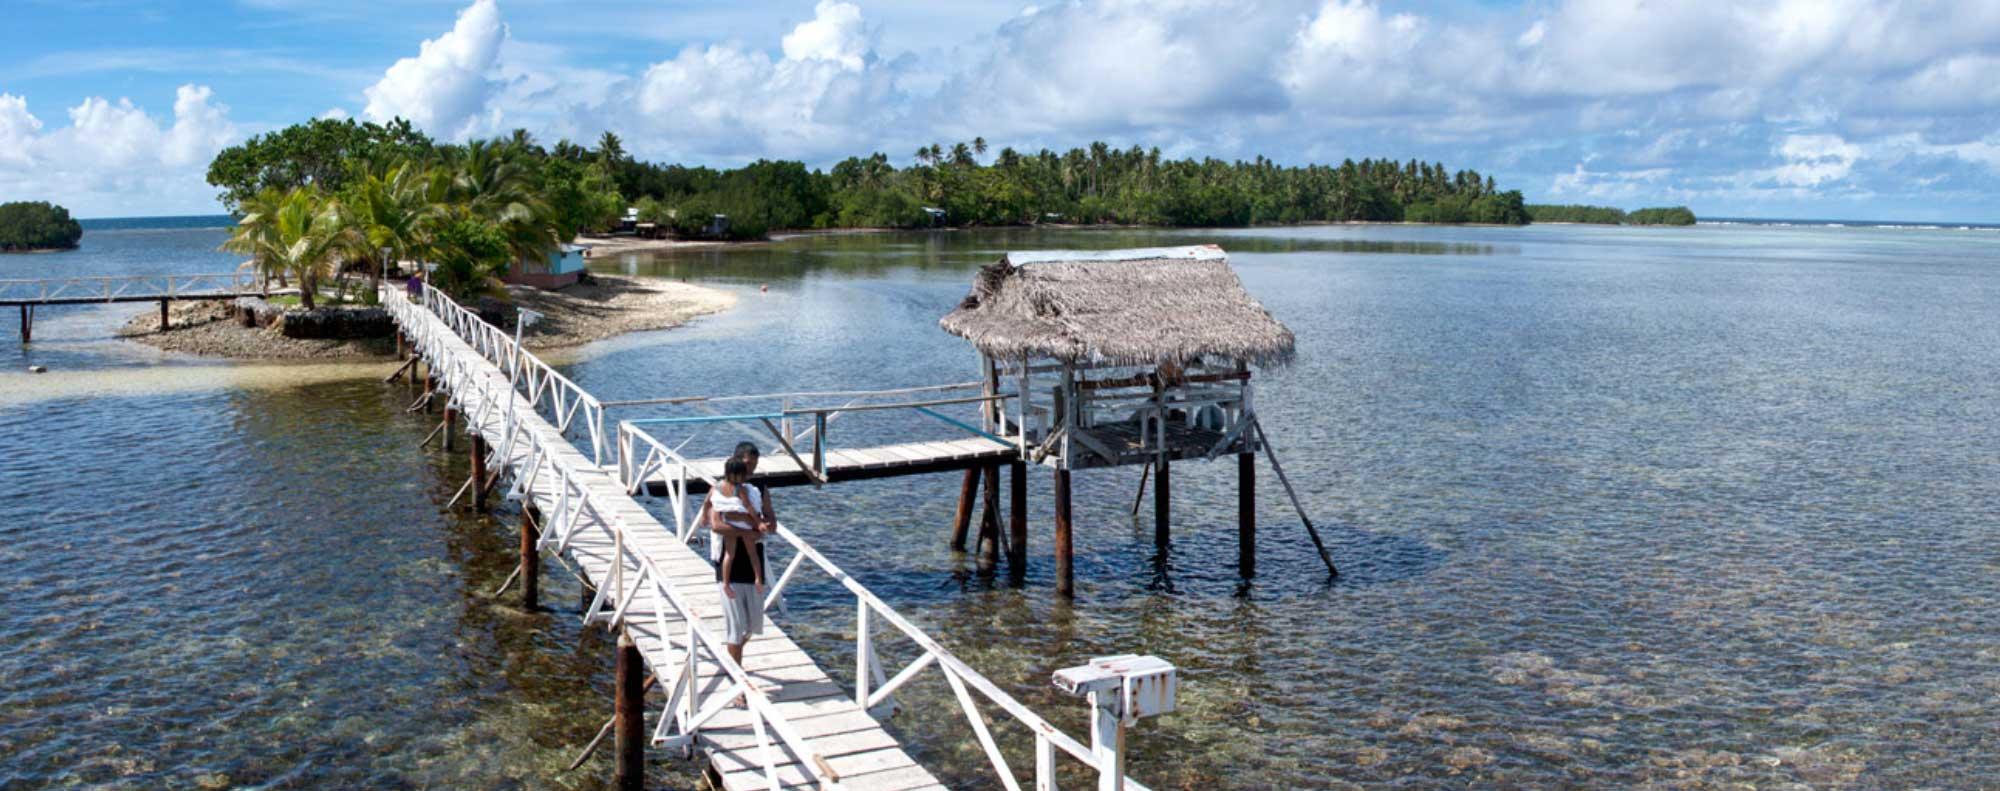 Micronesiatour Com Micronesia S Official Travel And Tour Website Guam Northern Mariana Islands Cnmi Saipan Tinian Rota Palau Federated States Of Micronesia Fsm Yap Chuuk Pohnpei Kosrae Marshall Islands Rmi